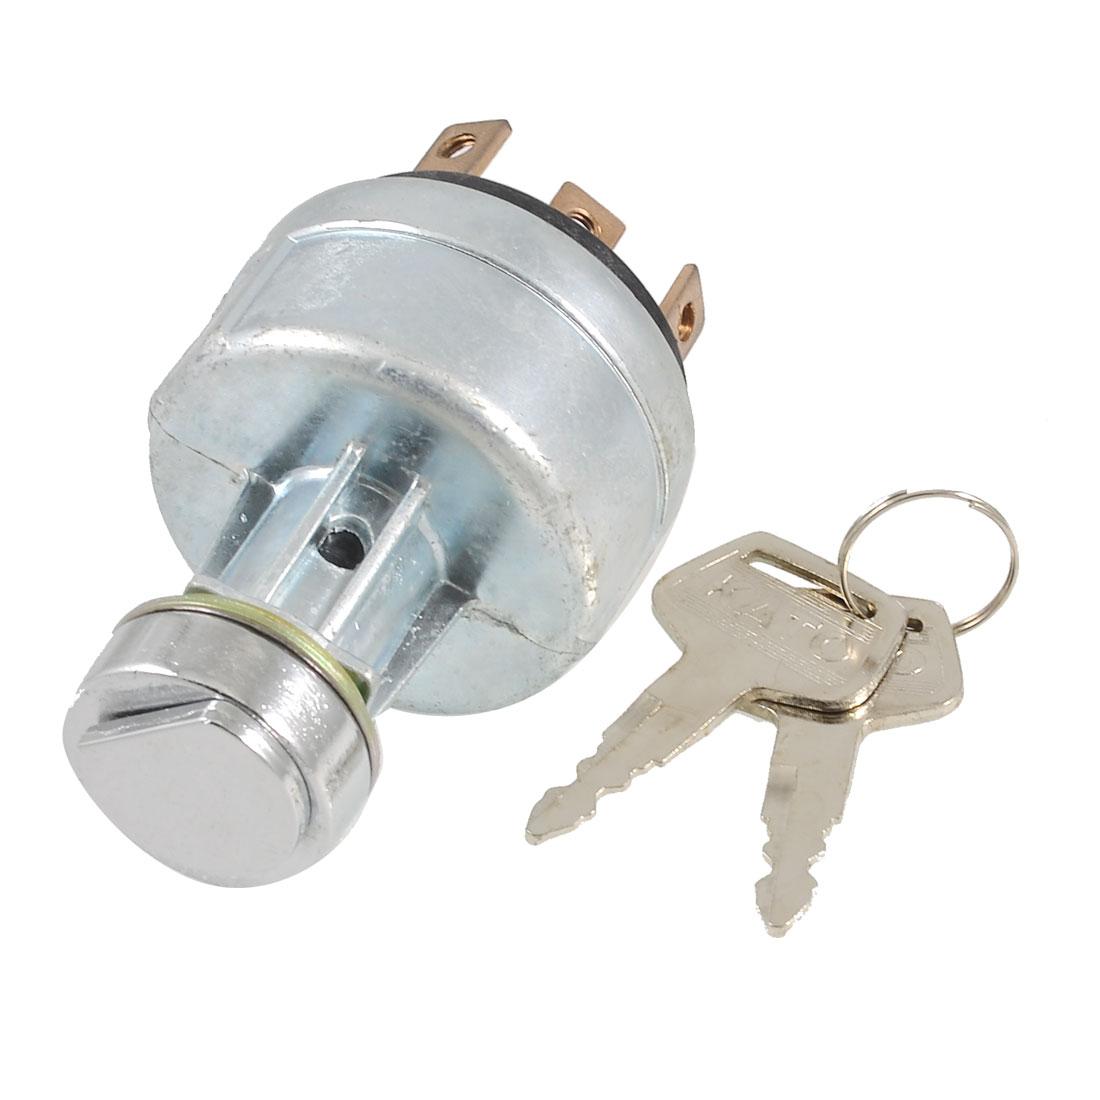 Silver Tone Metal Electric Door Lock w Keys for Kato Excavator